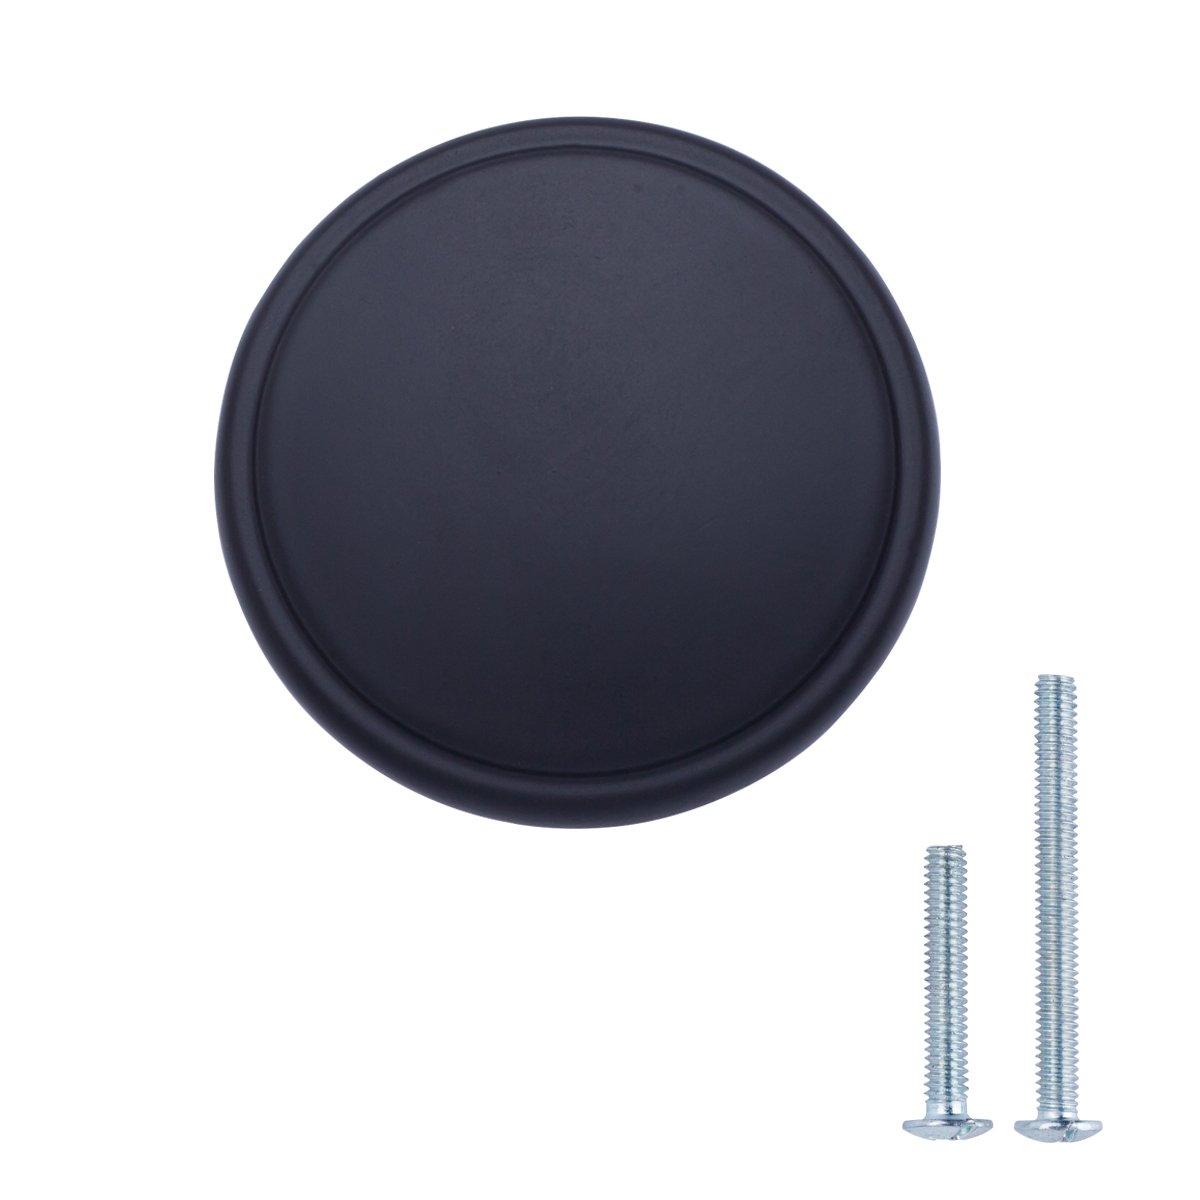 AmazonBasics Modern Wide Top Ring Cabinet Knob, 1.52'' Diameter, Flat Black, 25-Pack